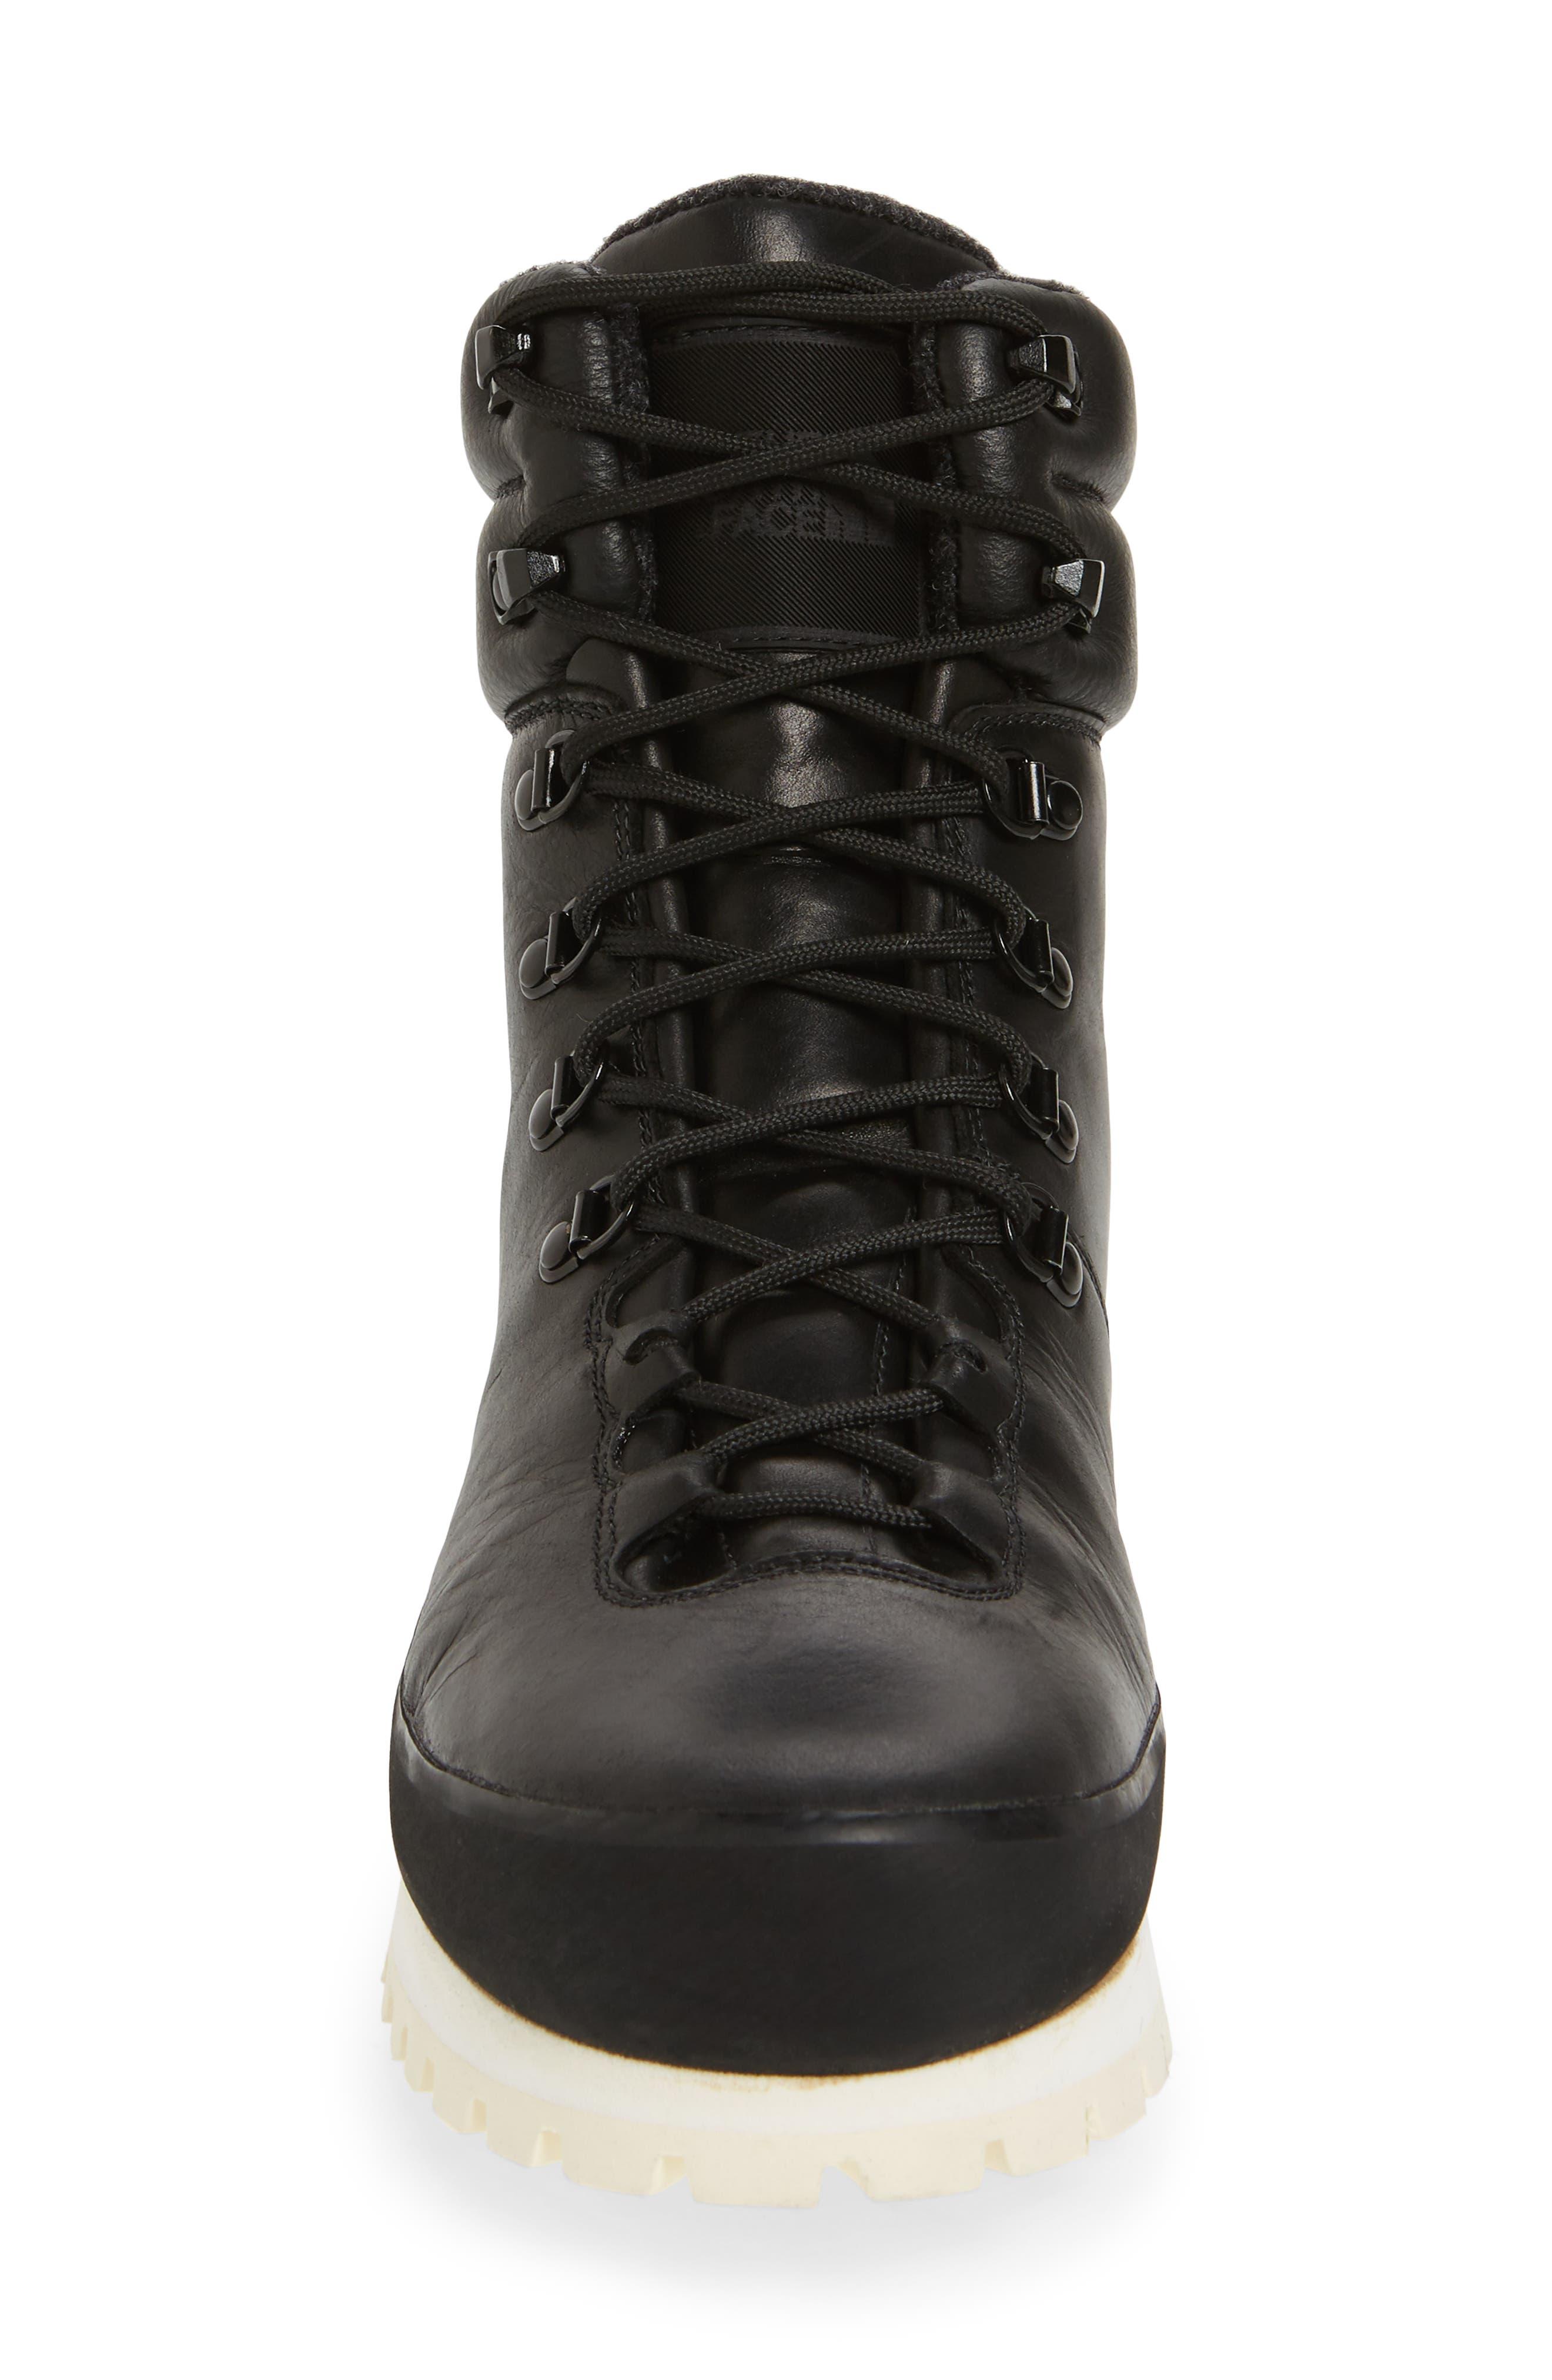 Cryos Hiker Boot,                             Alternate thumbnail 4, color,                             Tnf Black/ Tnf White